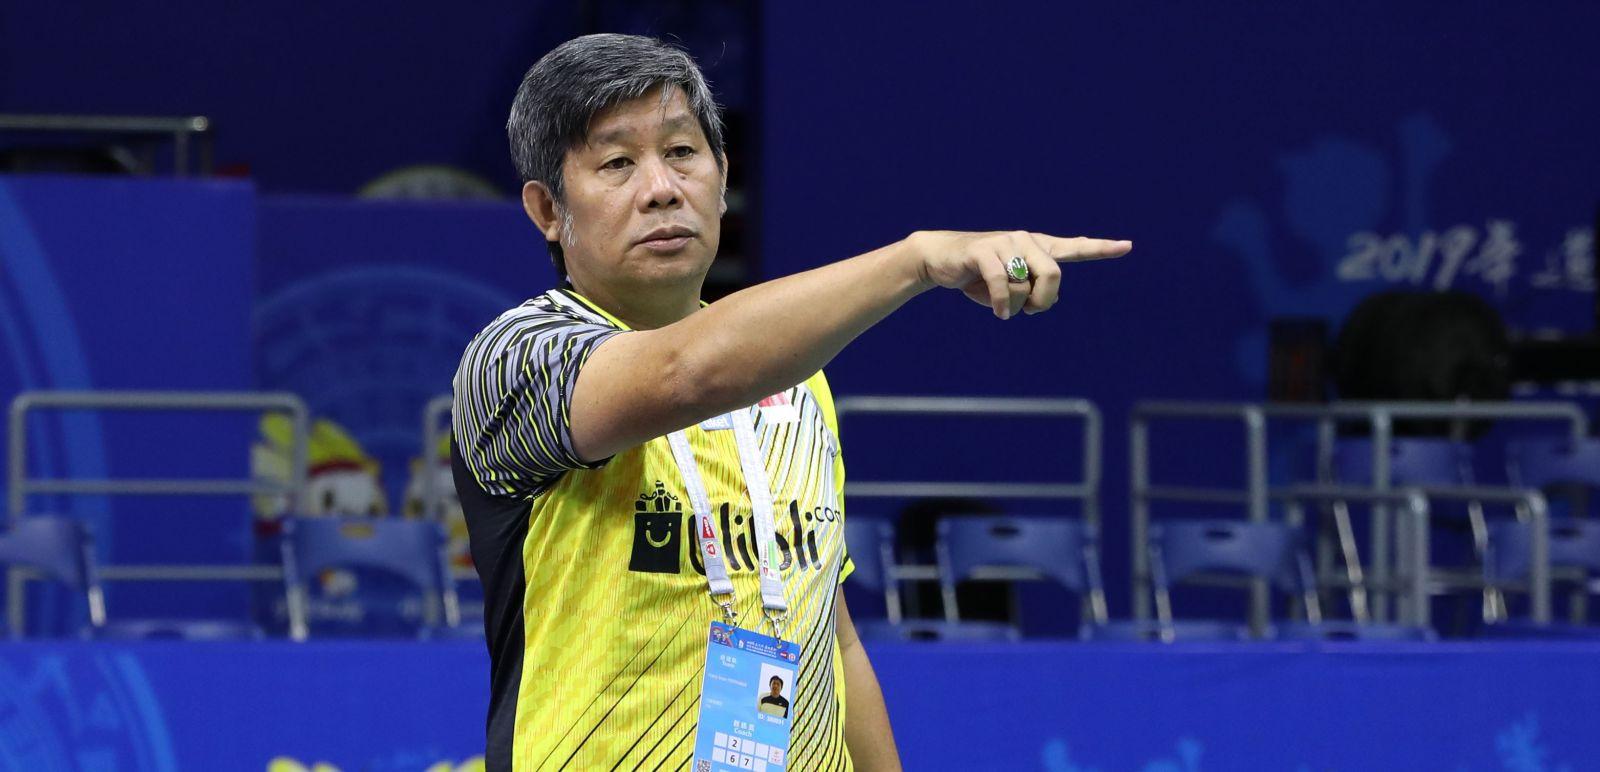 Pelatih Bongkar Aib Fajar/Rian Usai Gagal Total di Thailand Open